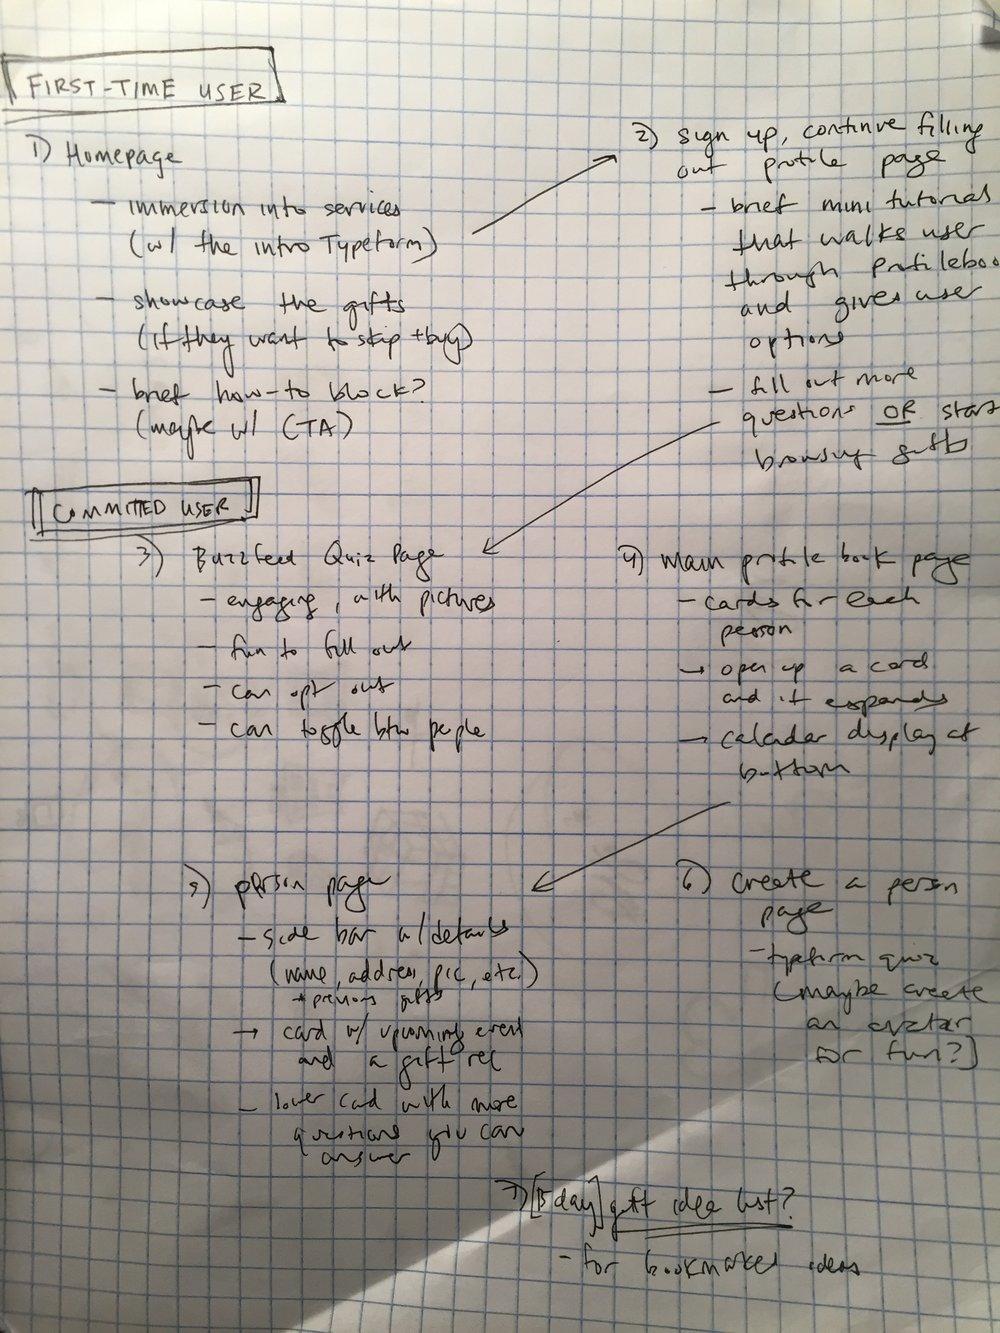 1. Brainstorm